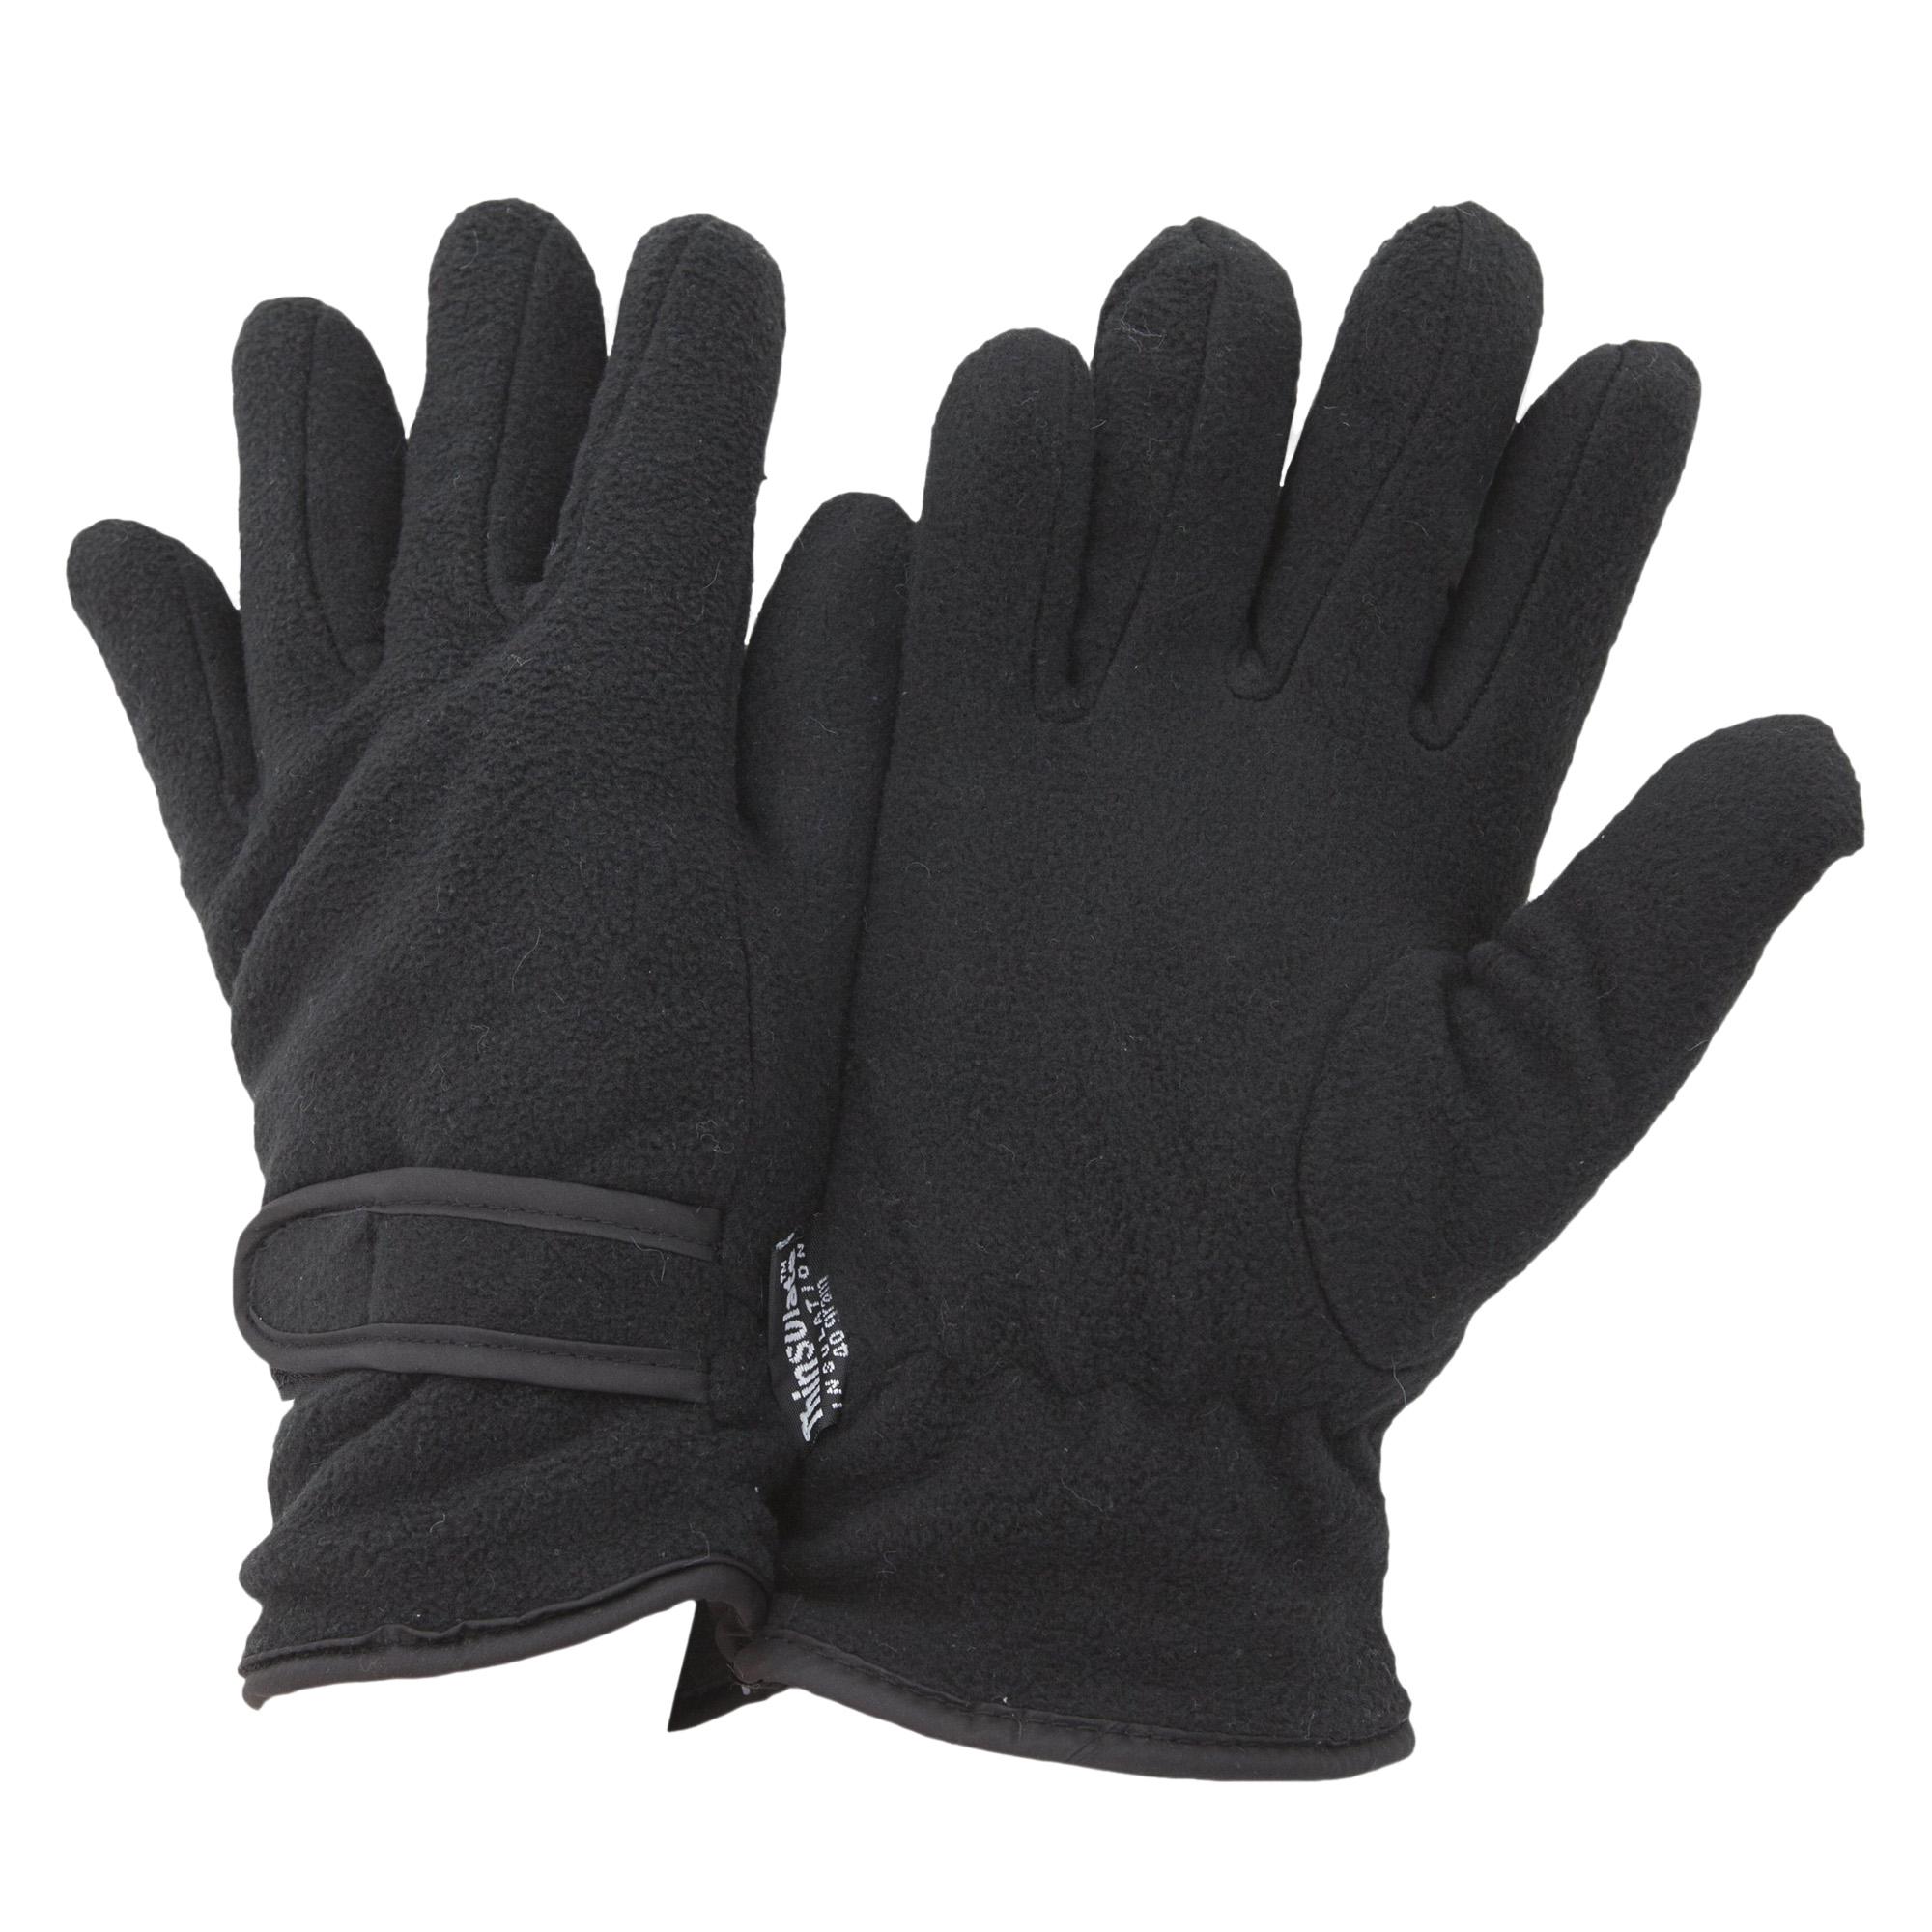 FLOSO Ladies /Womens Thinsulate Fleece Thermal Winter Warm ...